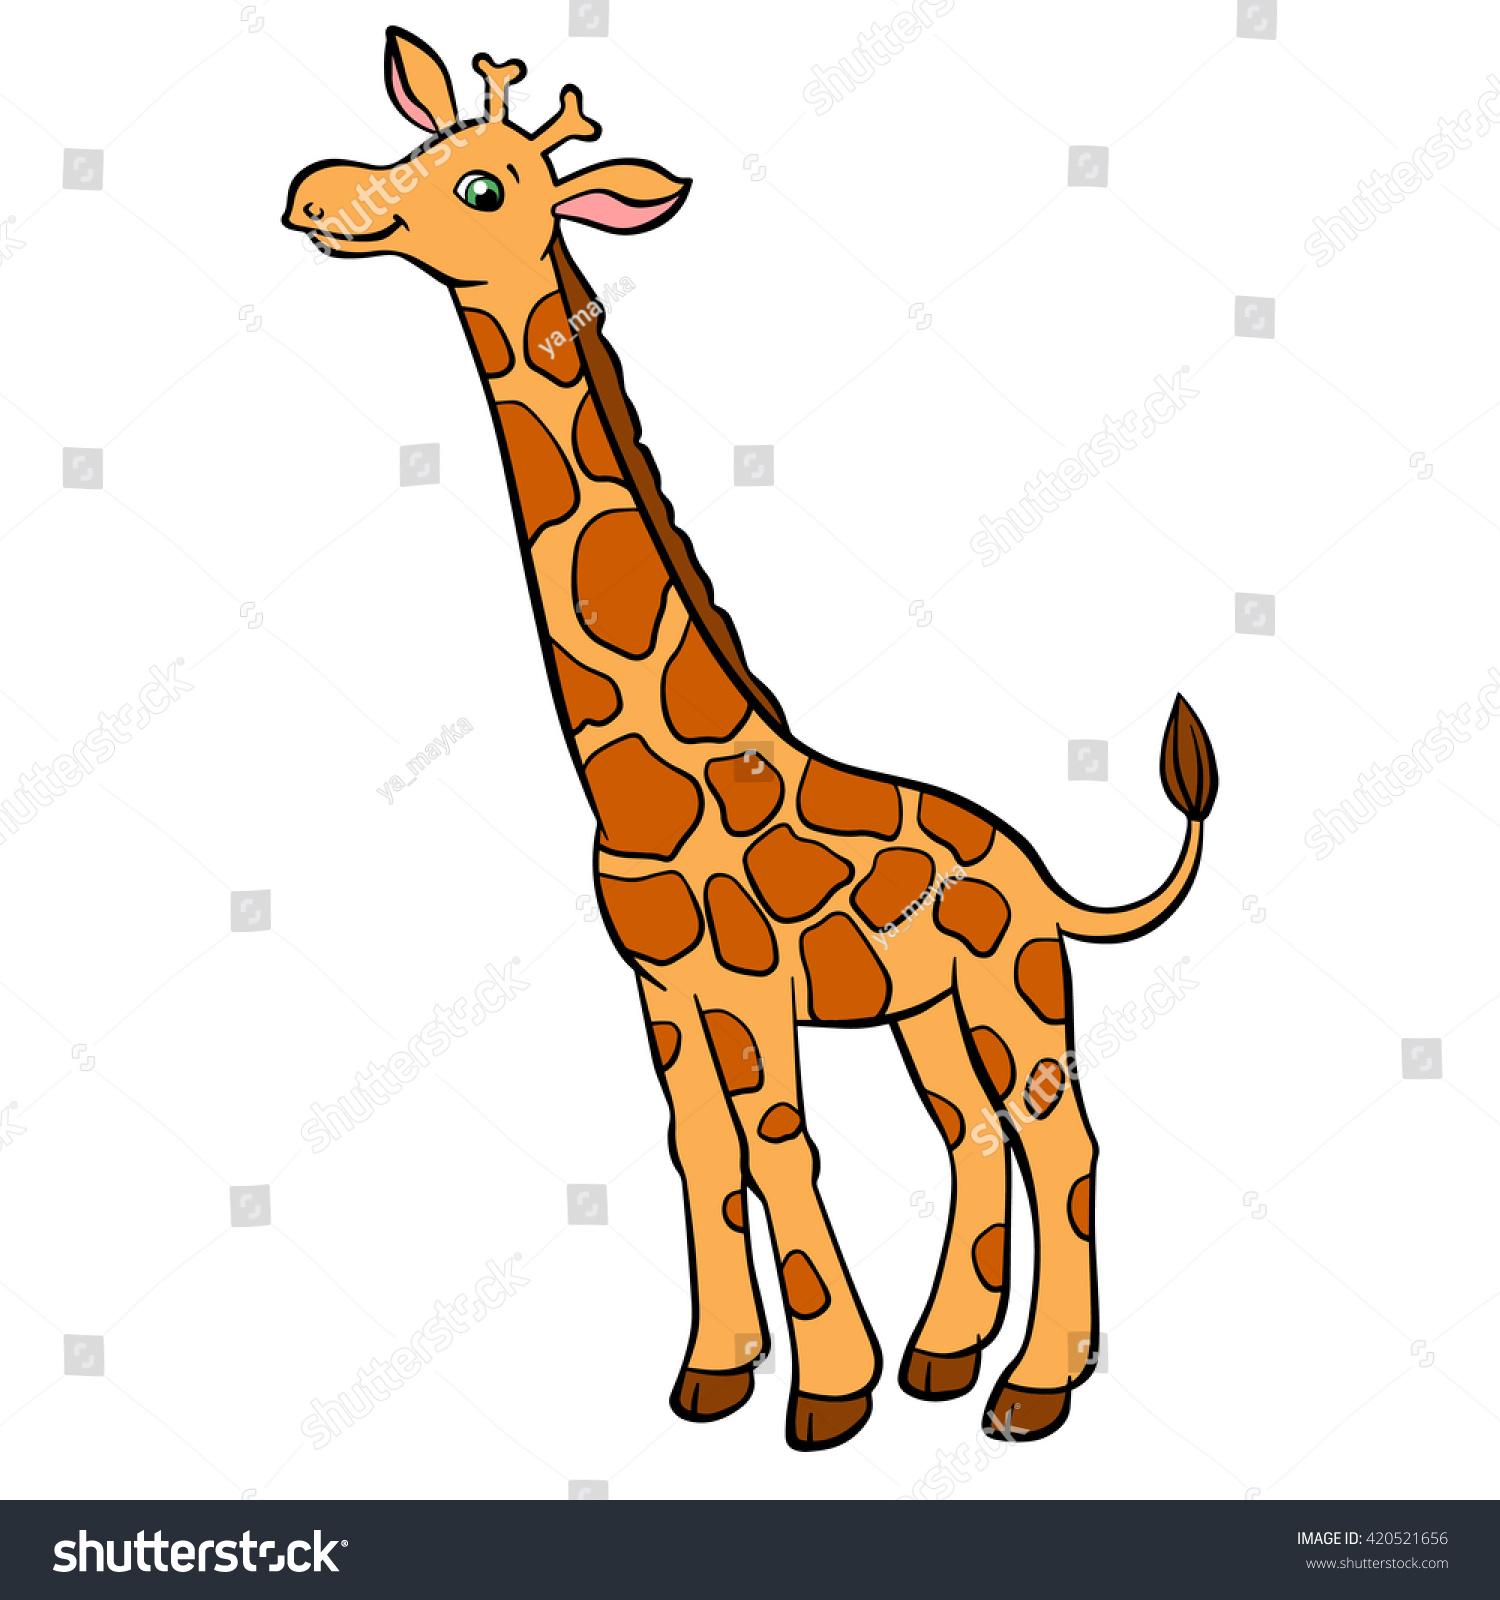 Cartoon giraffe head and neck - photo#23